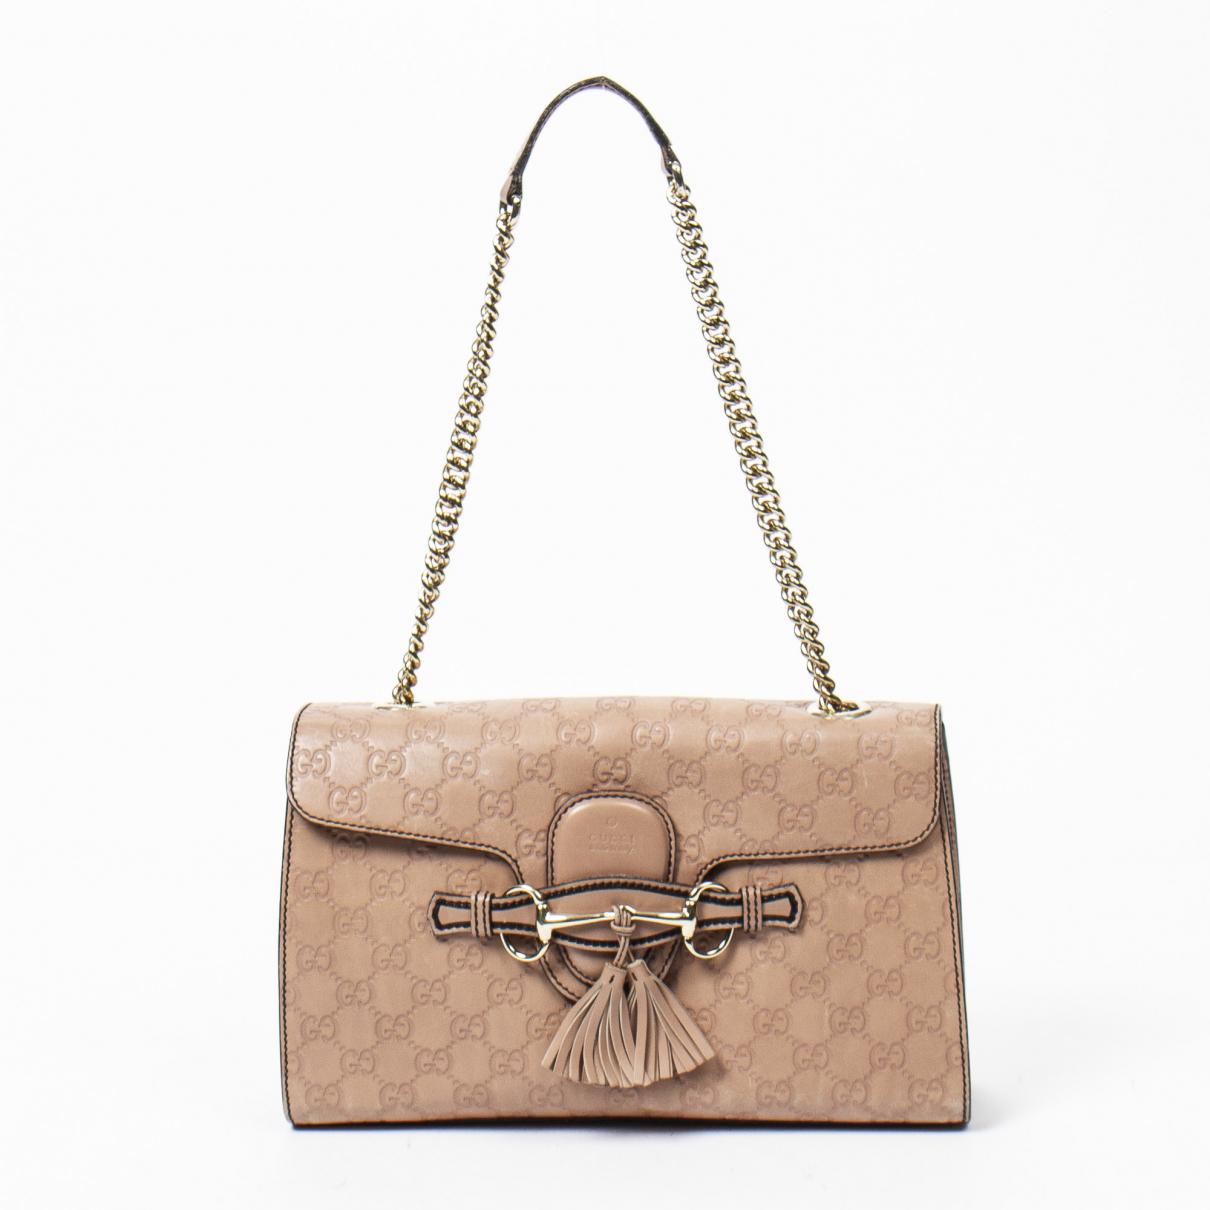 Gucci Emily Handtasche in Leder